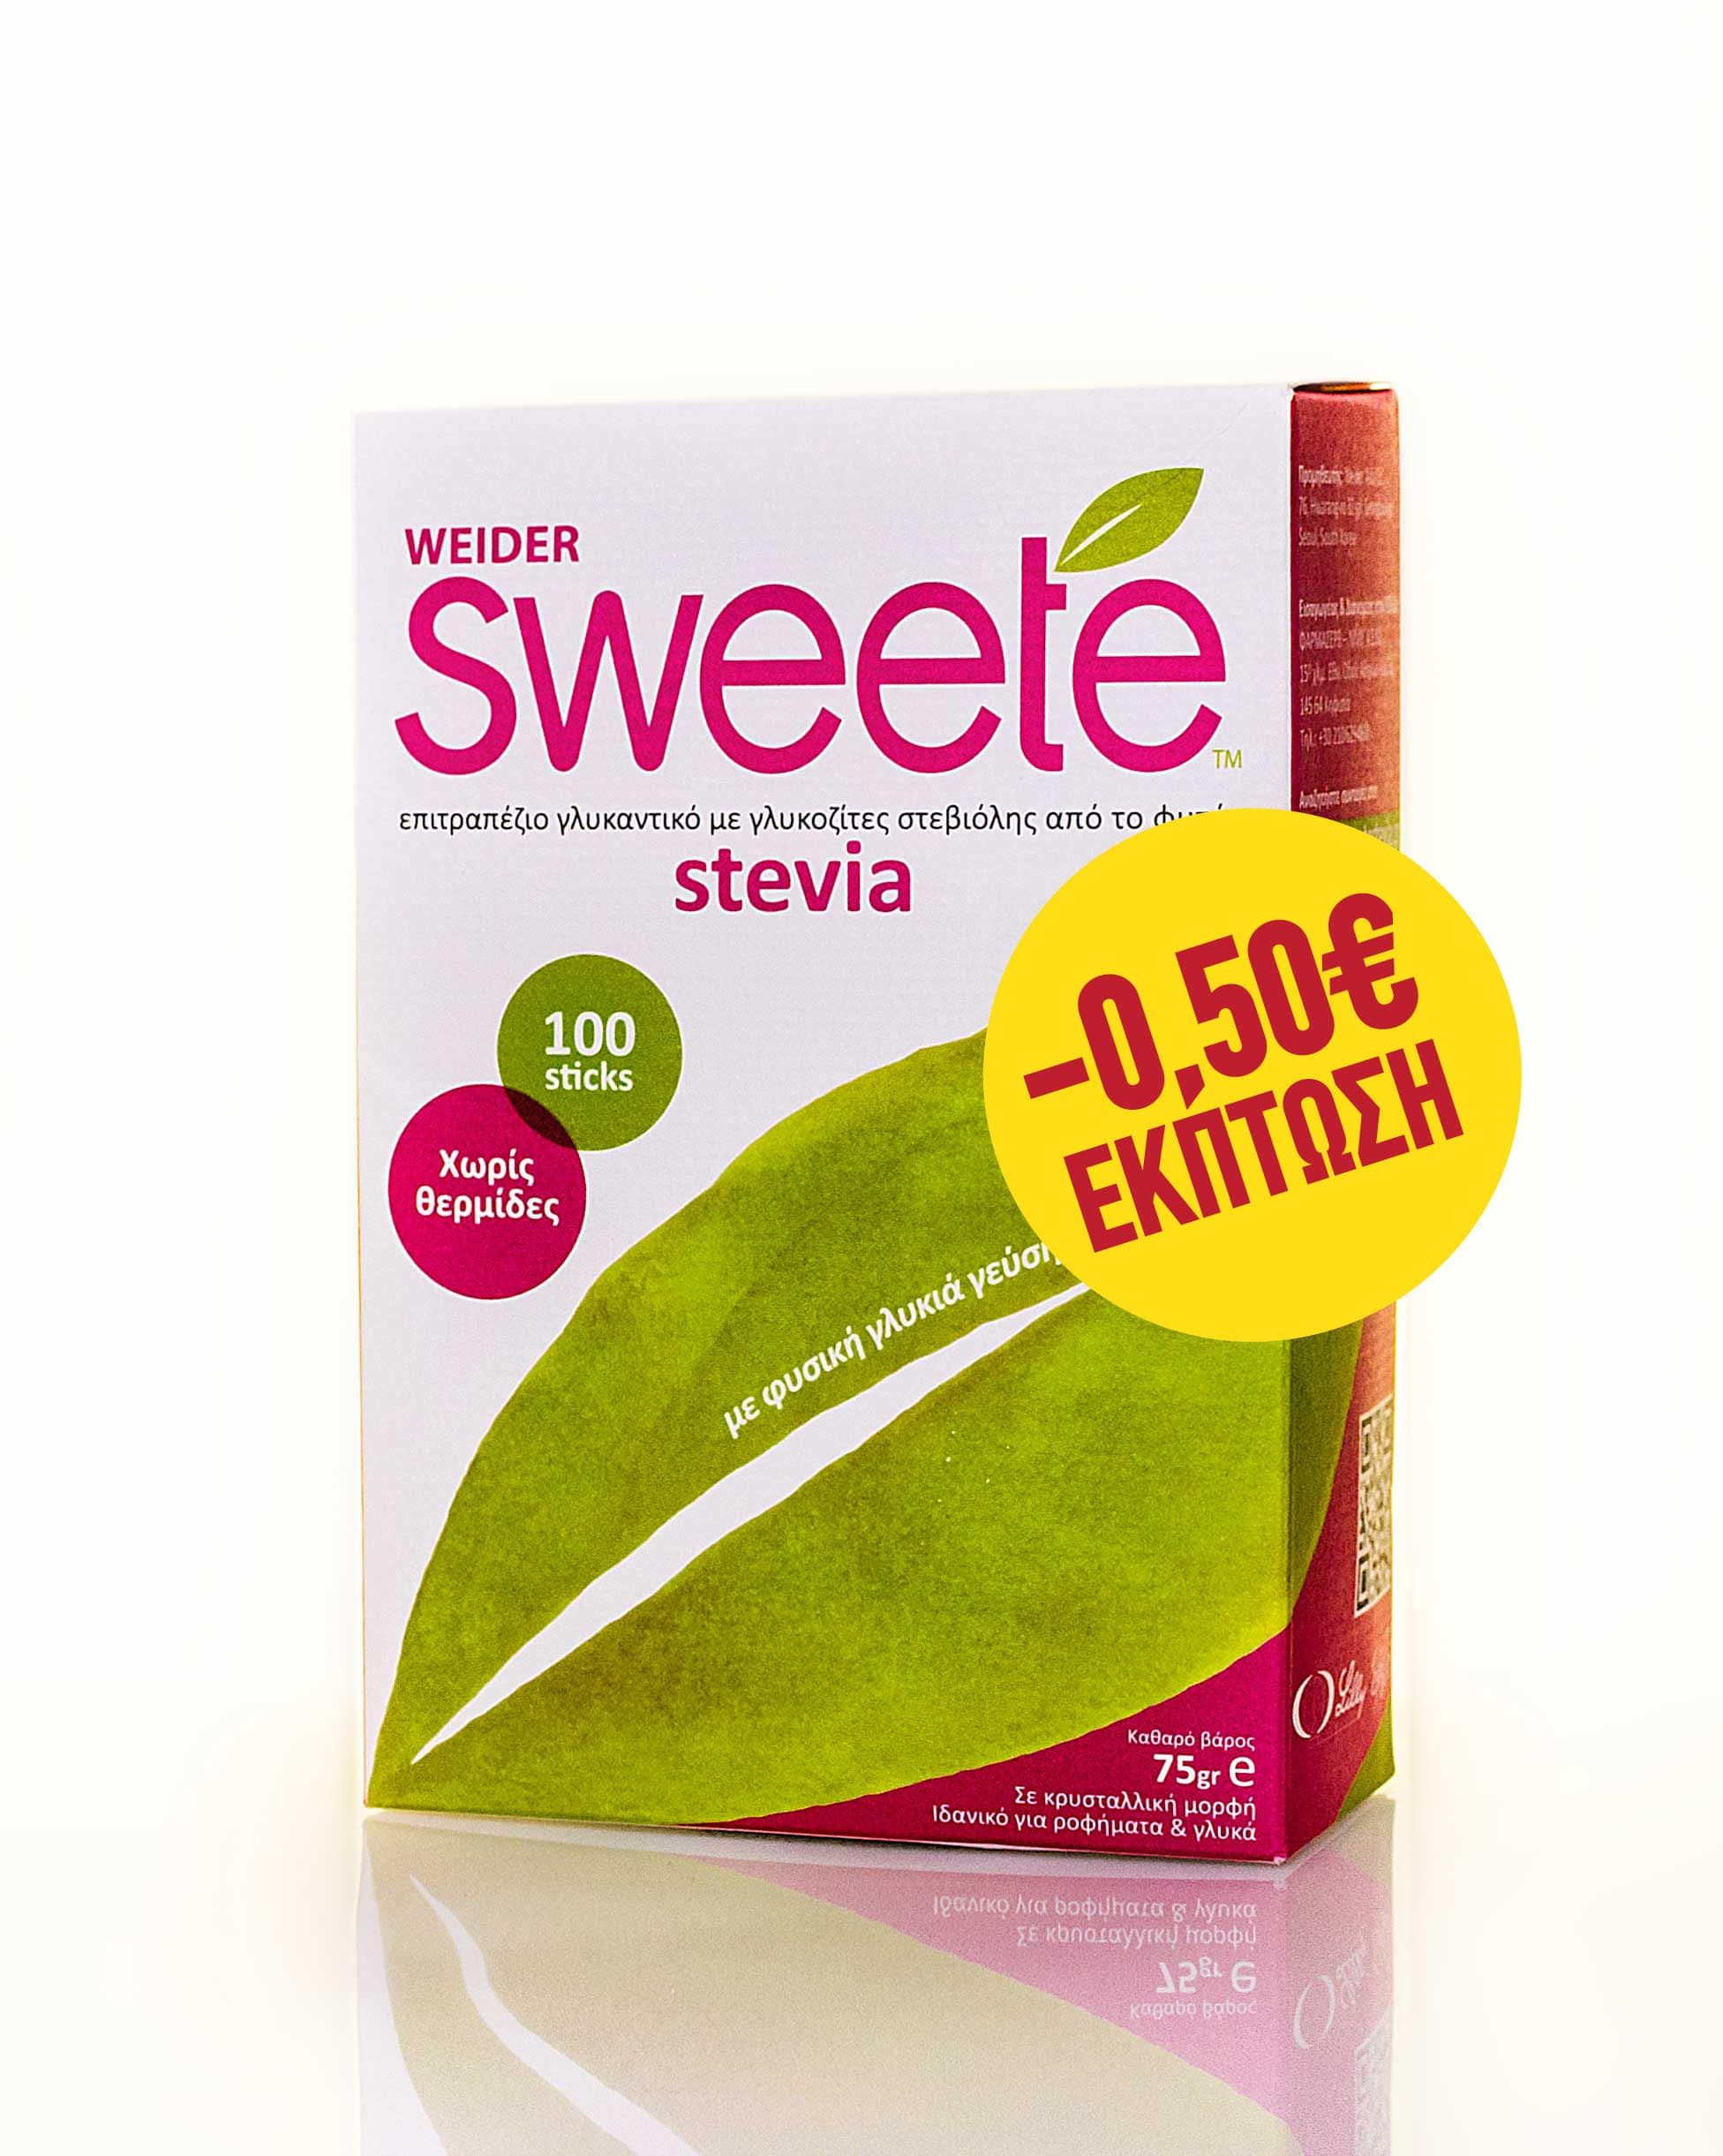 Sweete Στέβια PROMO -0.50€ Υποκατάστατο Ζάχαρης με Στέβια, 100 sticks